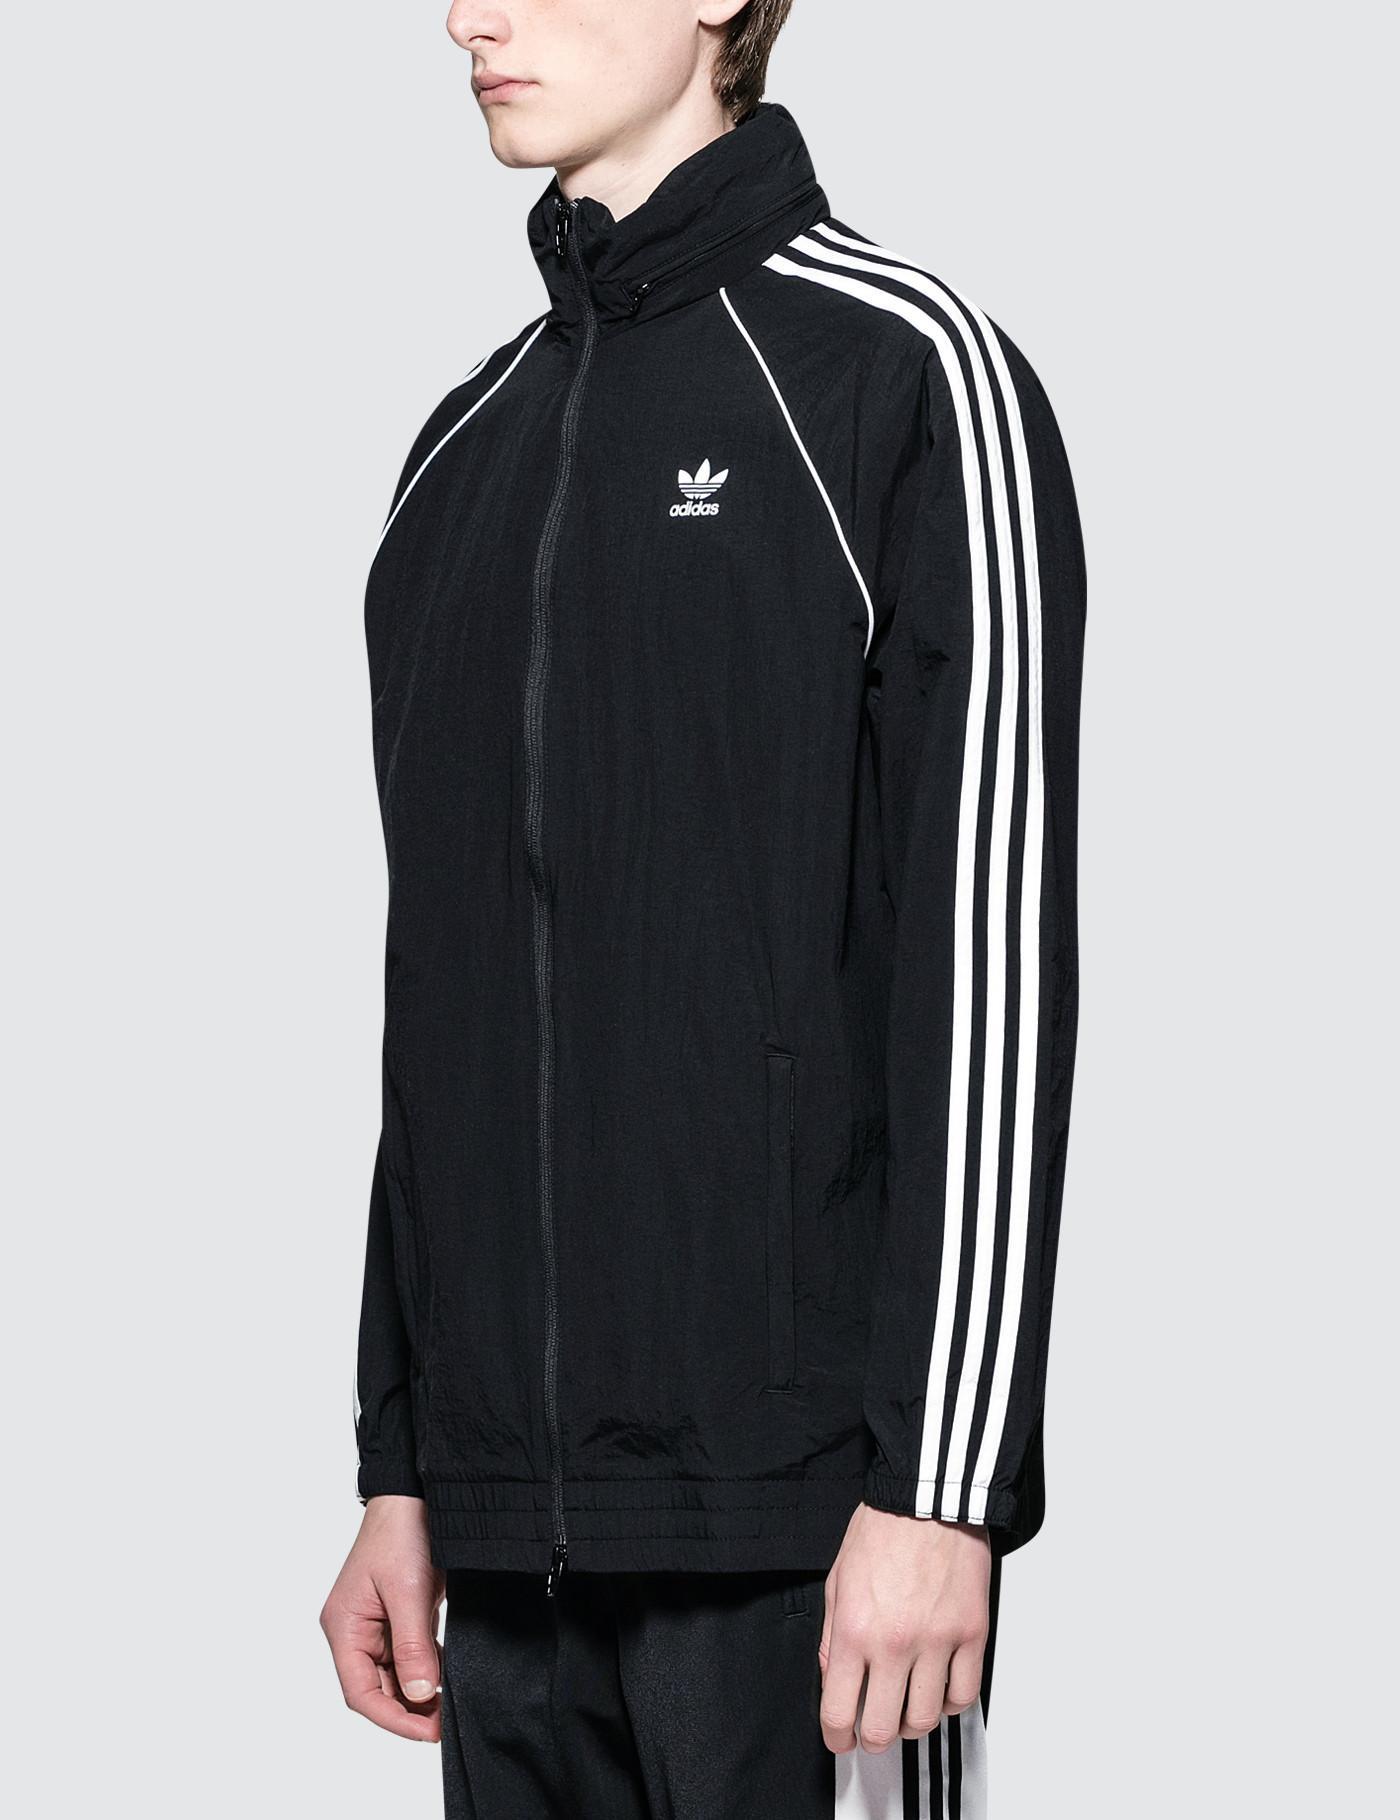 d89bfccc9c9ac5 adidas Originals Superstar Windbreaker in Black for Men - Save 59% - Lyst